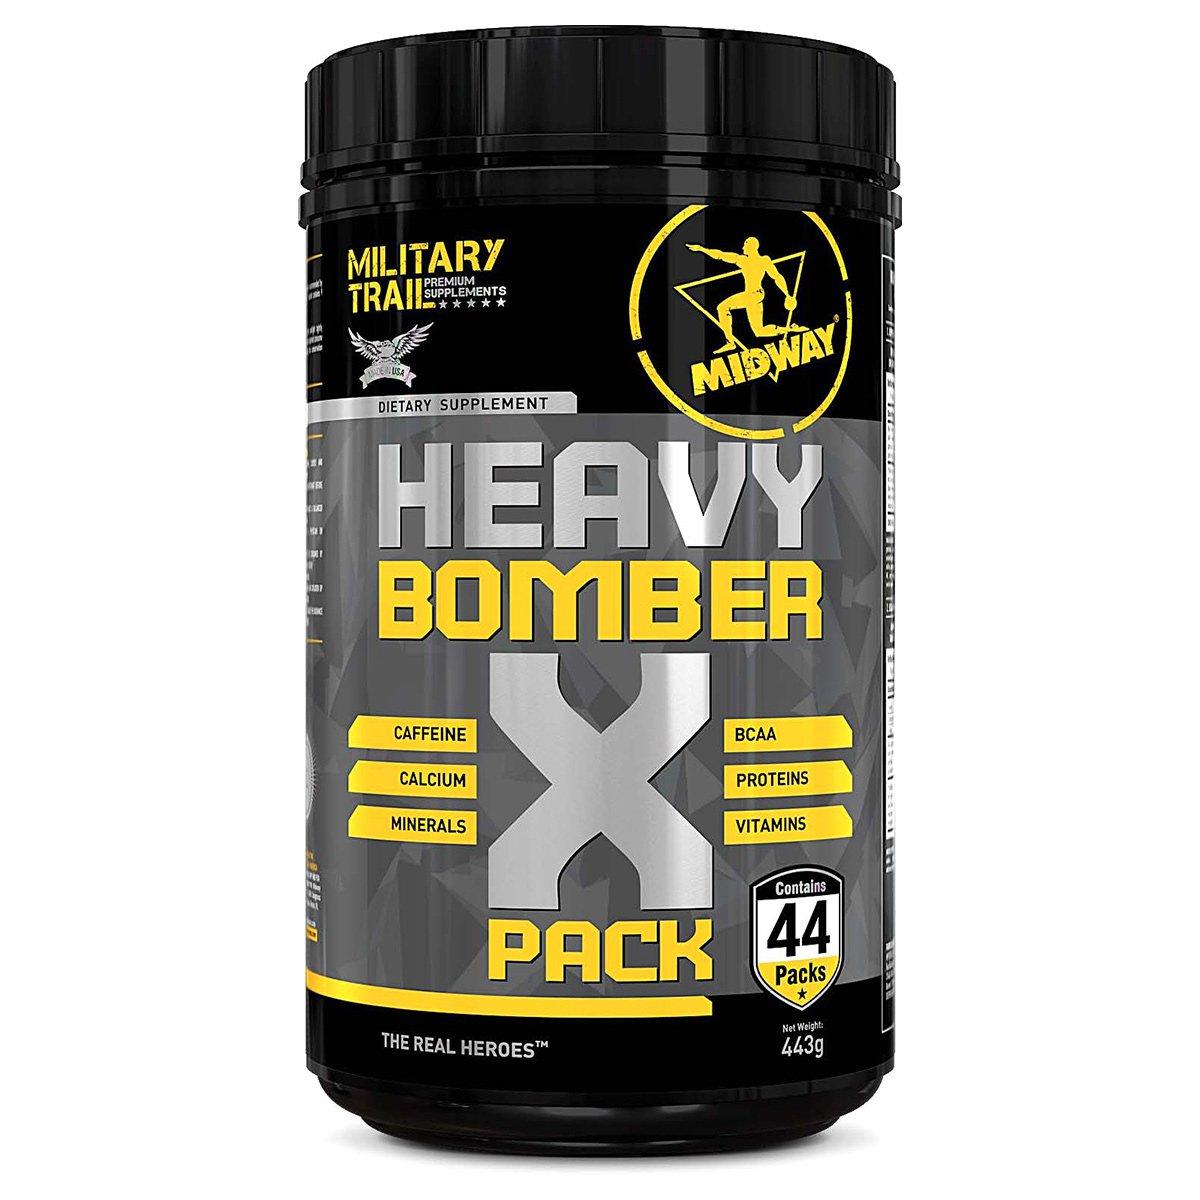 Heavy Bomber Military Trail Pack Pré Treino completo com cafeína, aminoácidos, vitaminas e minerais